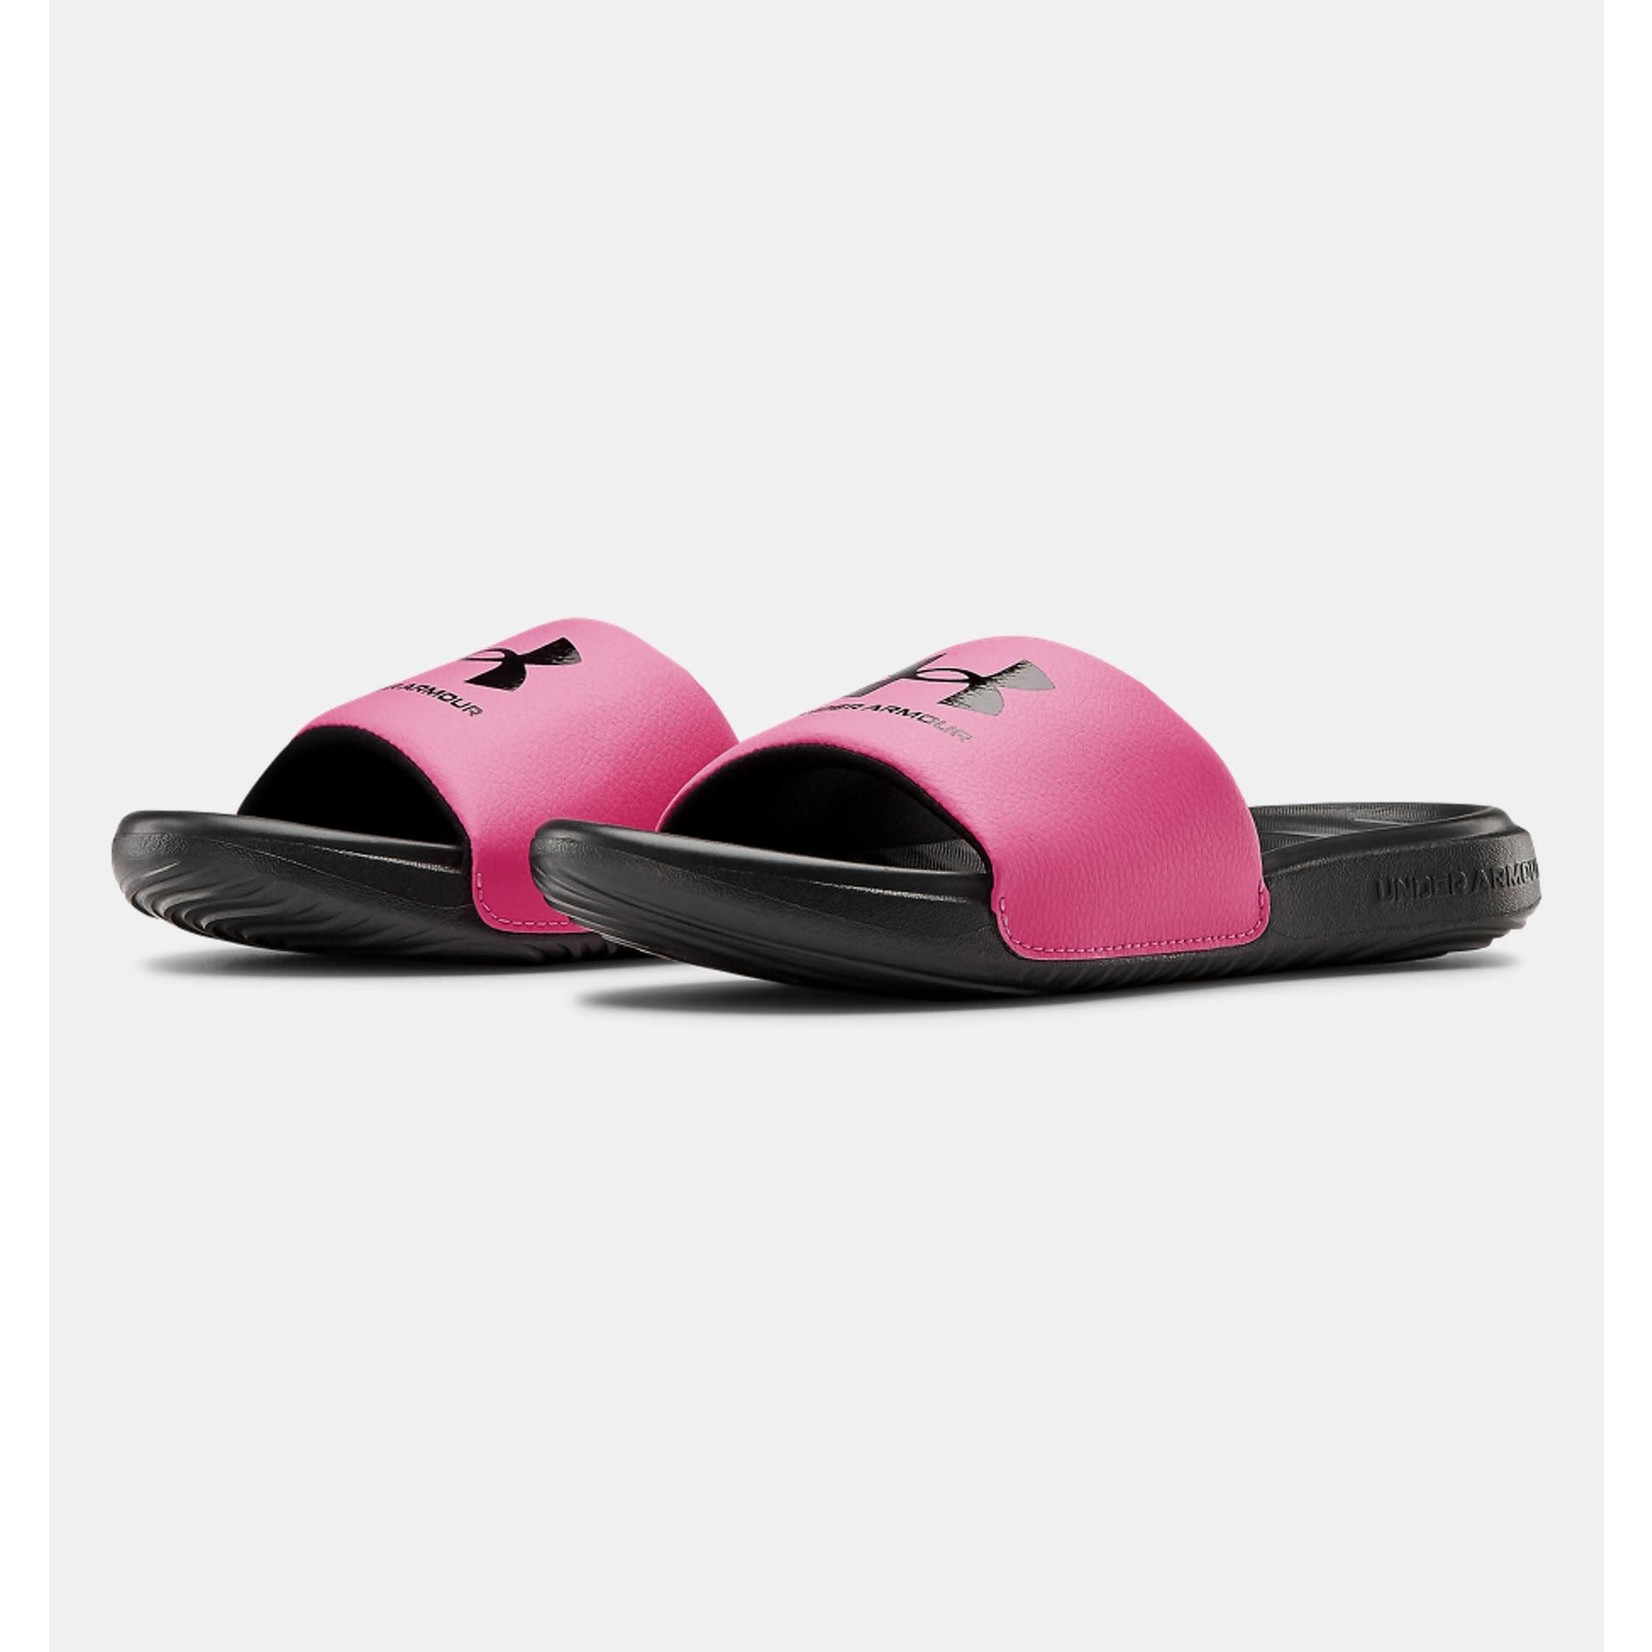 Under Armour Under Armour Sandals, Ansa Fix Slide, Girls